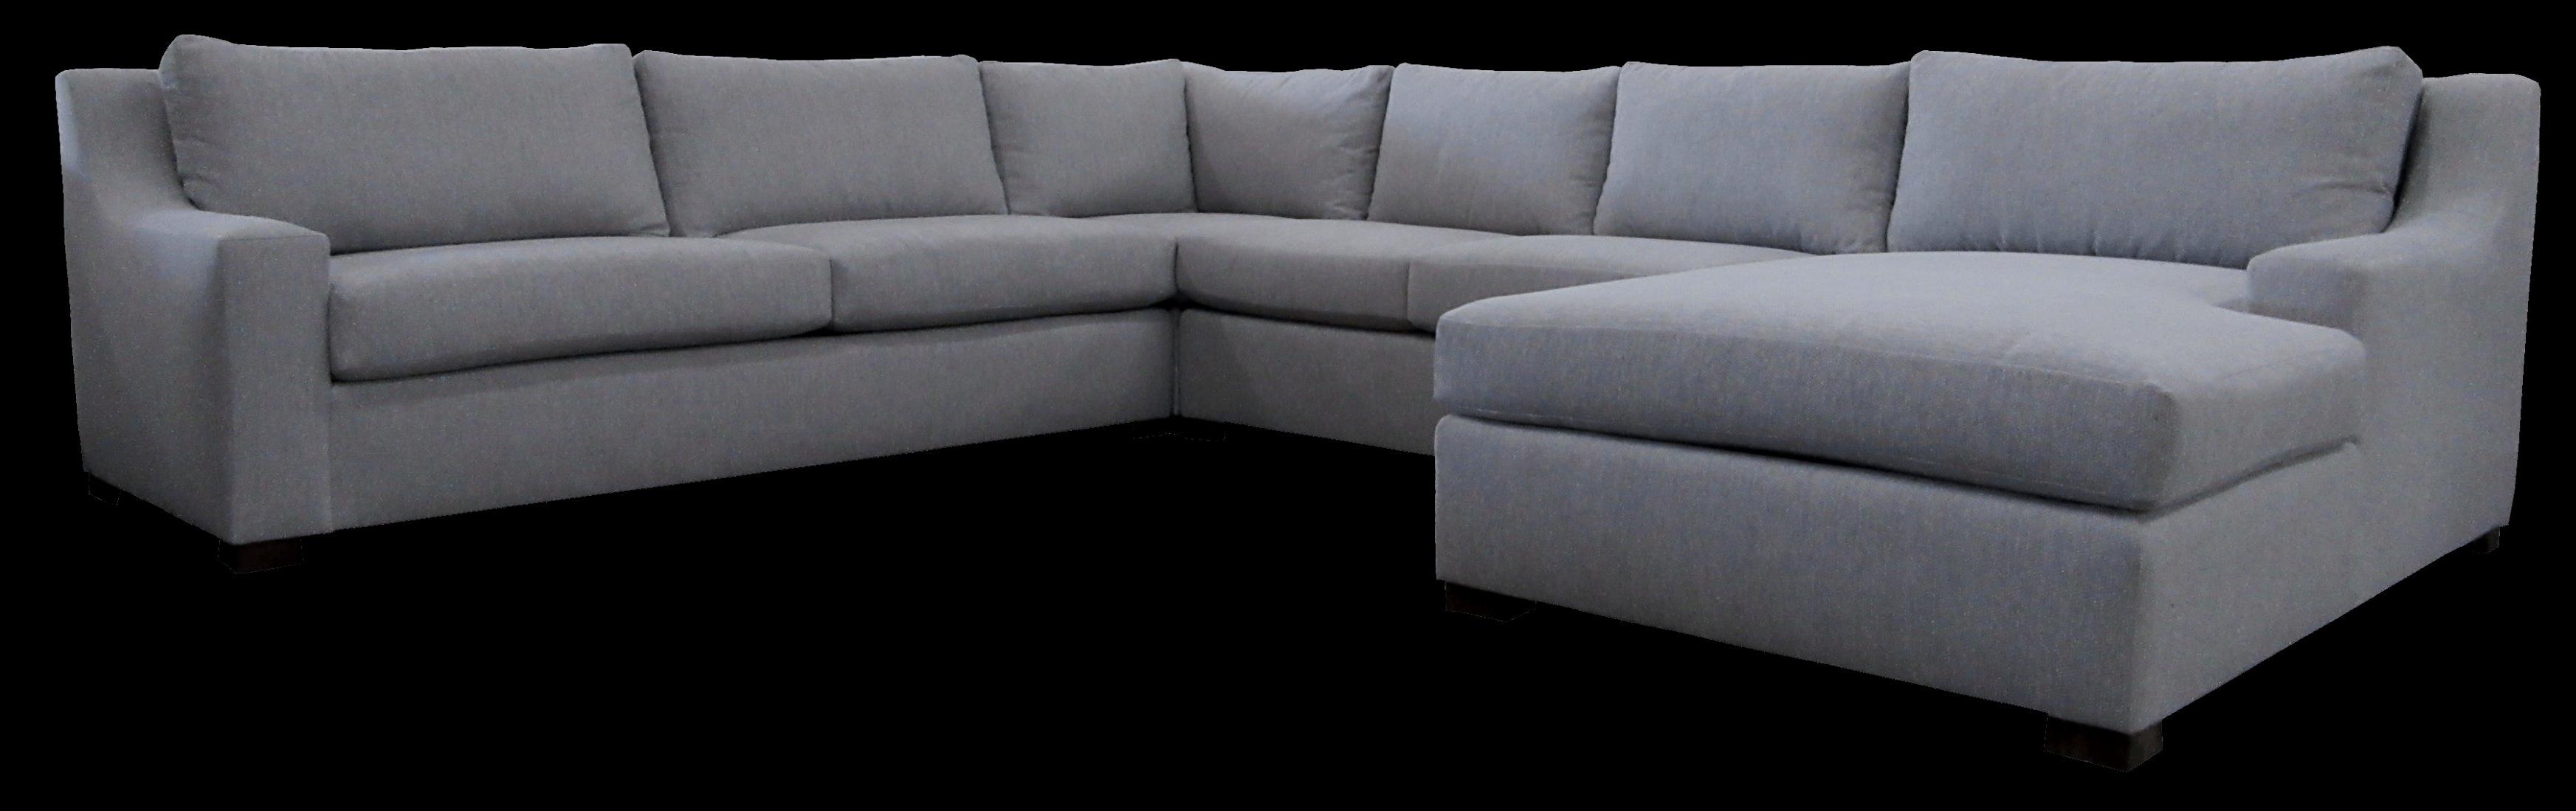 Sofas Valladolid Liquidacion Irdz Liquidacion sofas Chaise Longue Especial Hermosa sofa Cama